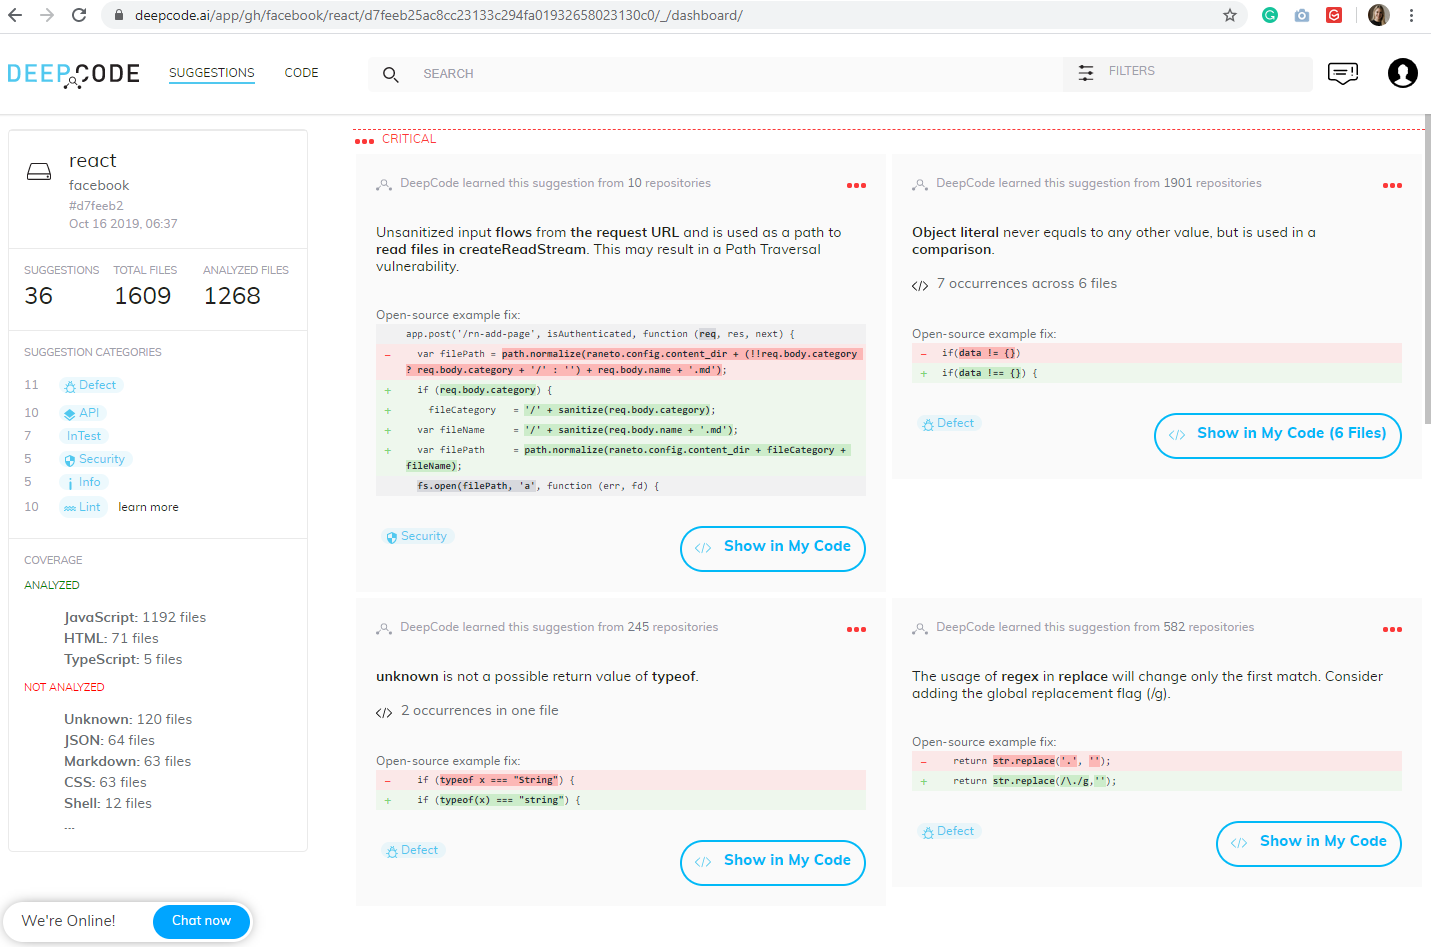 DeepCode web-based semantic code analysis